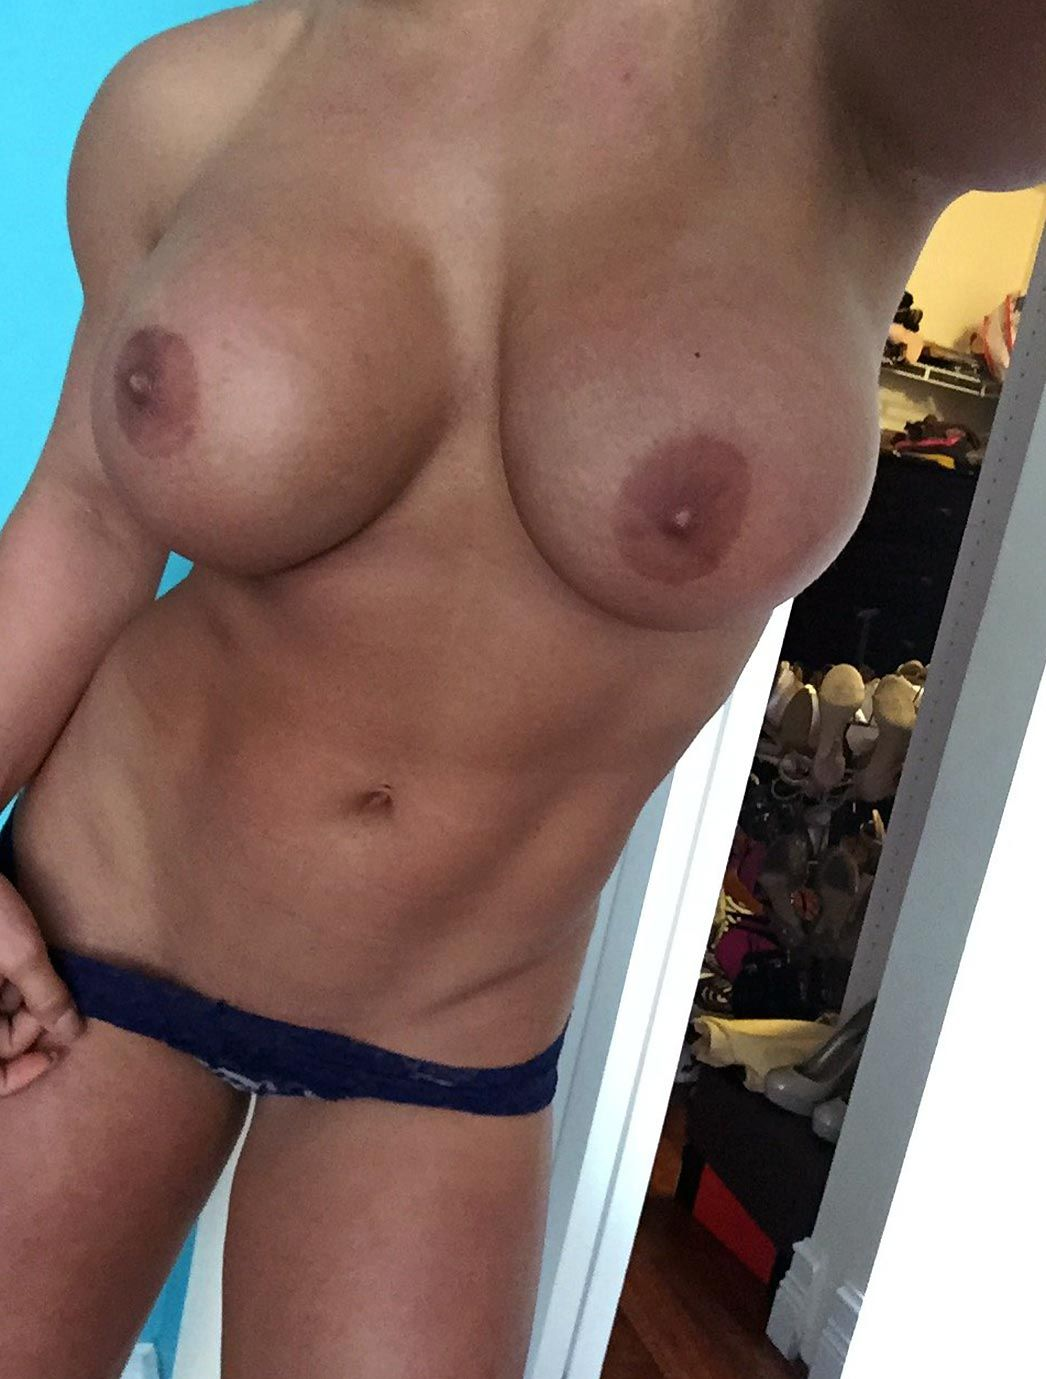 Celeste Bonin Nude Leaked The Fappening & Sexy 0201